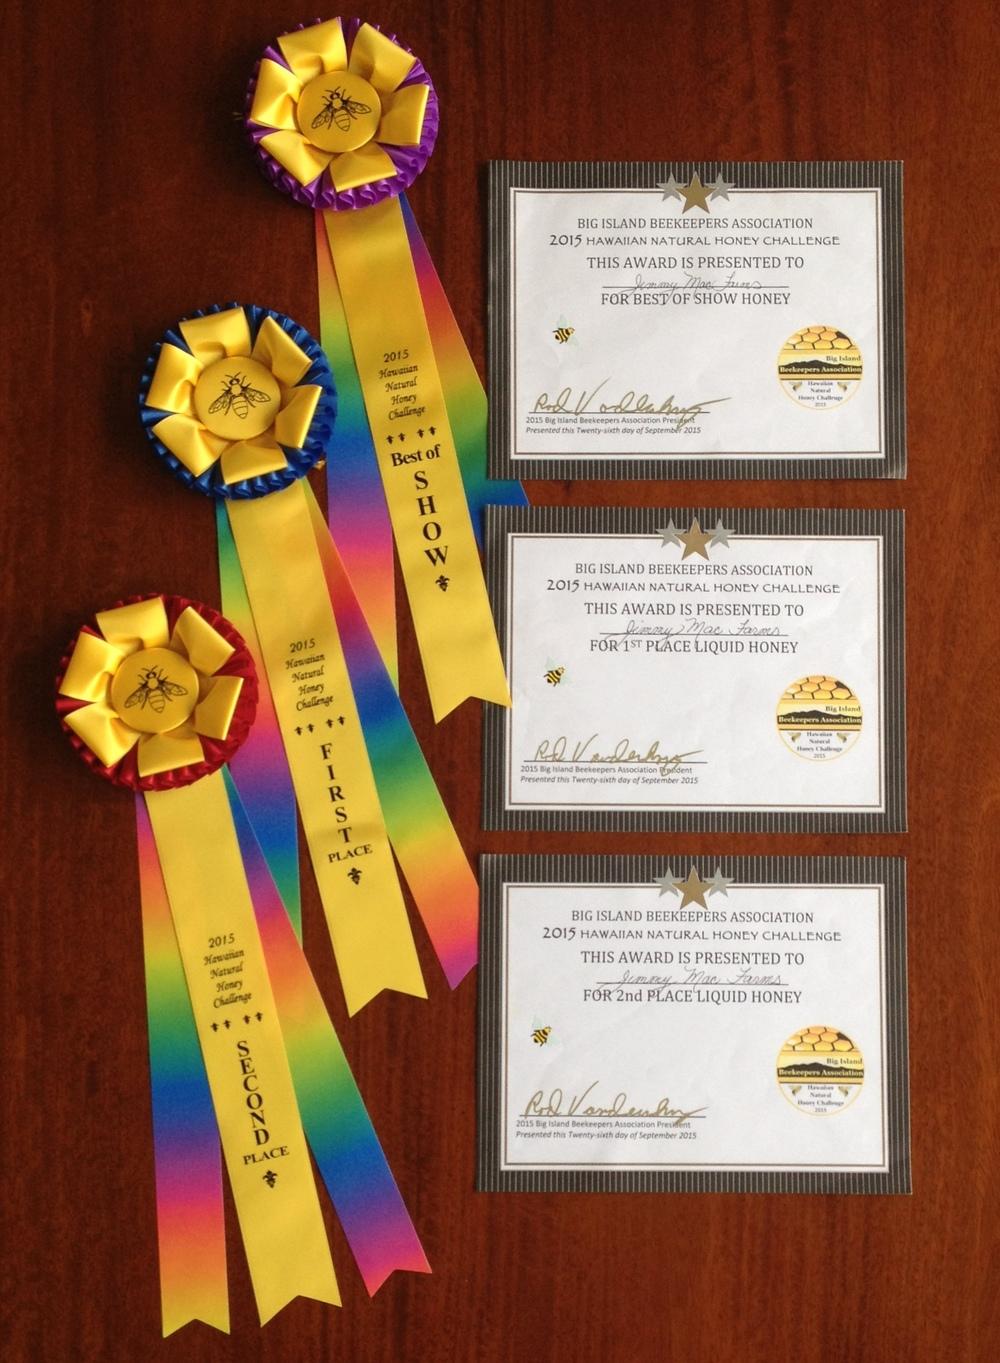 Pure Award Winning Raw Hawaiian Honey From The Pristine Big Island